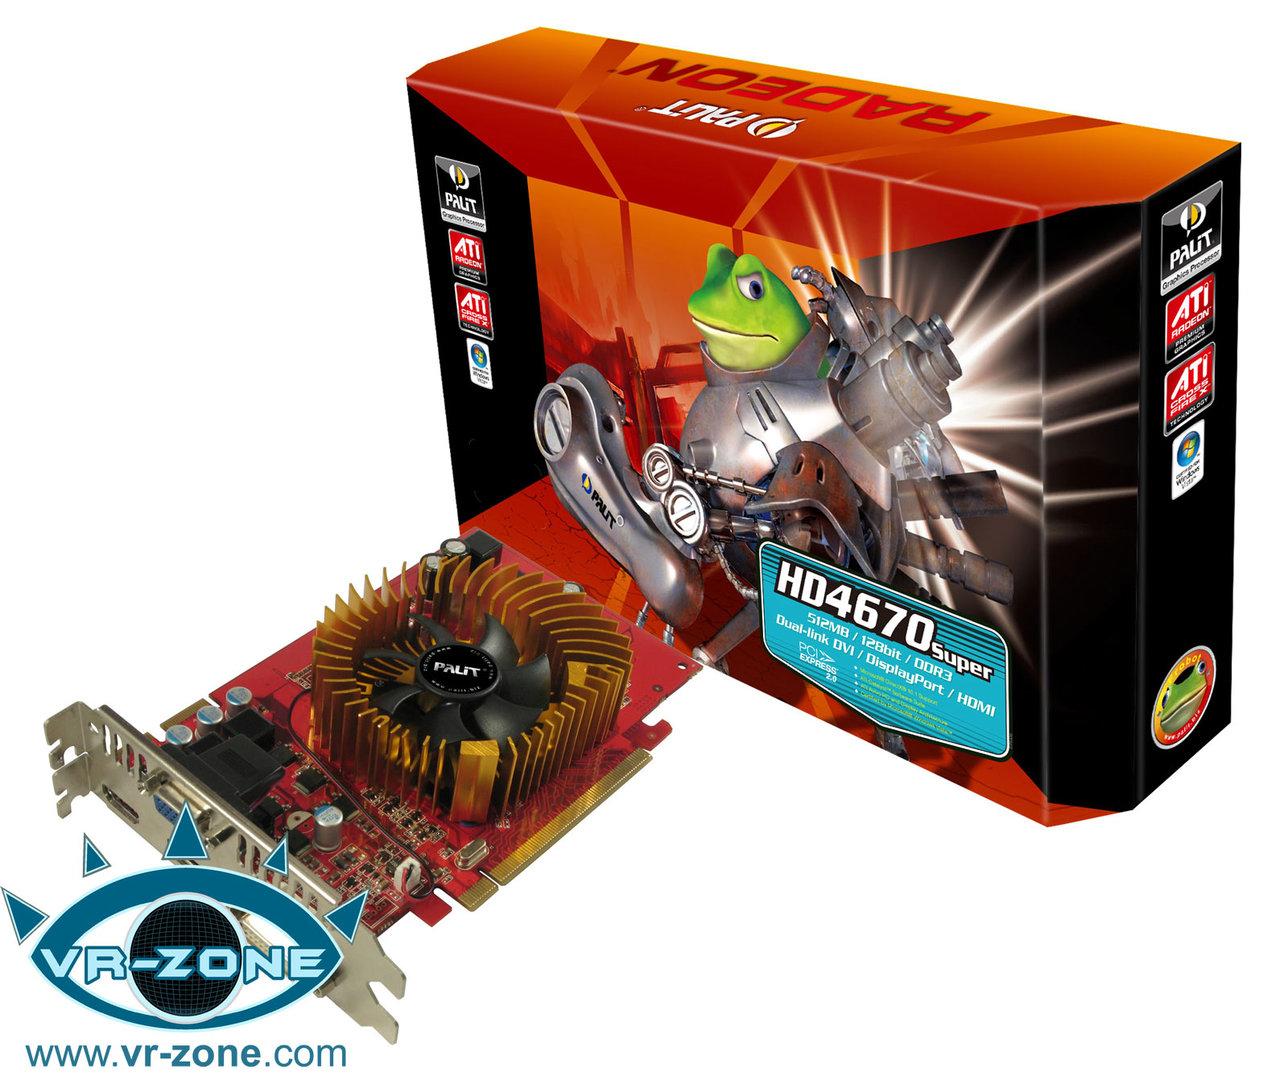 Palit Radeon HD 4670 Super